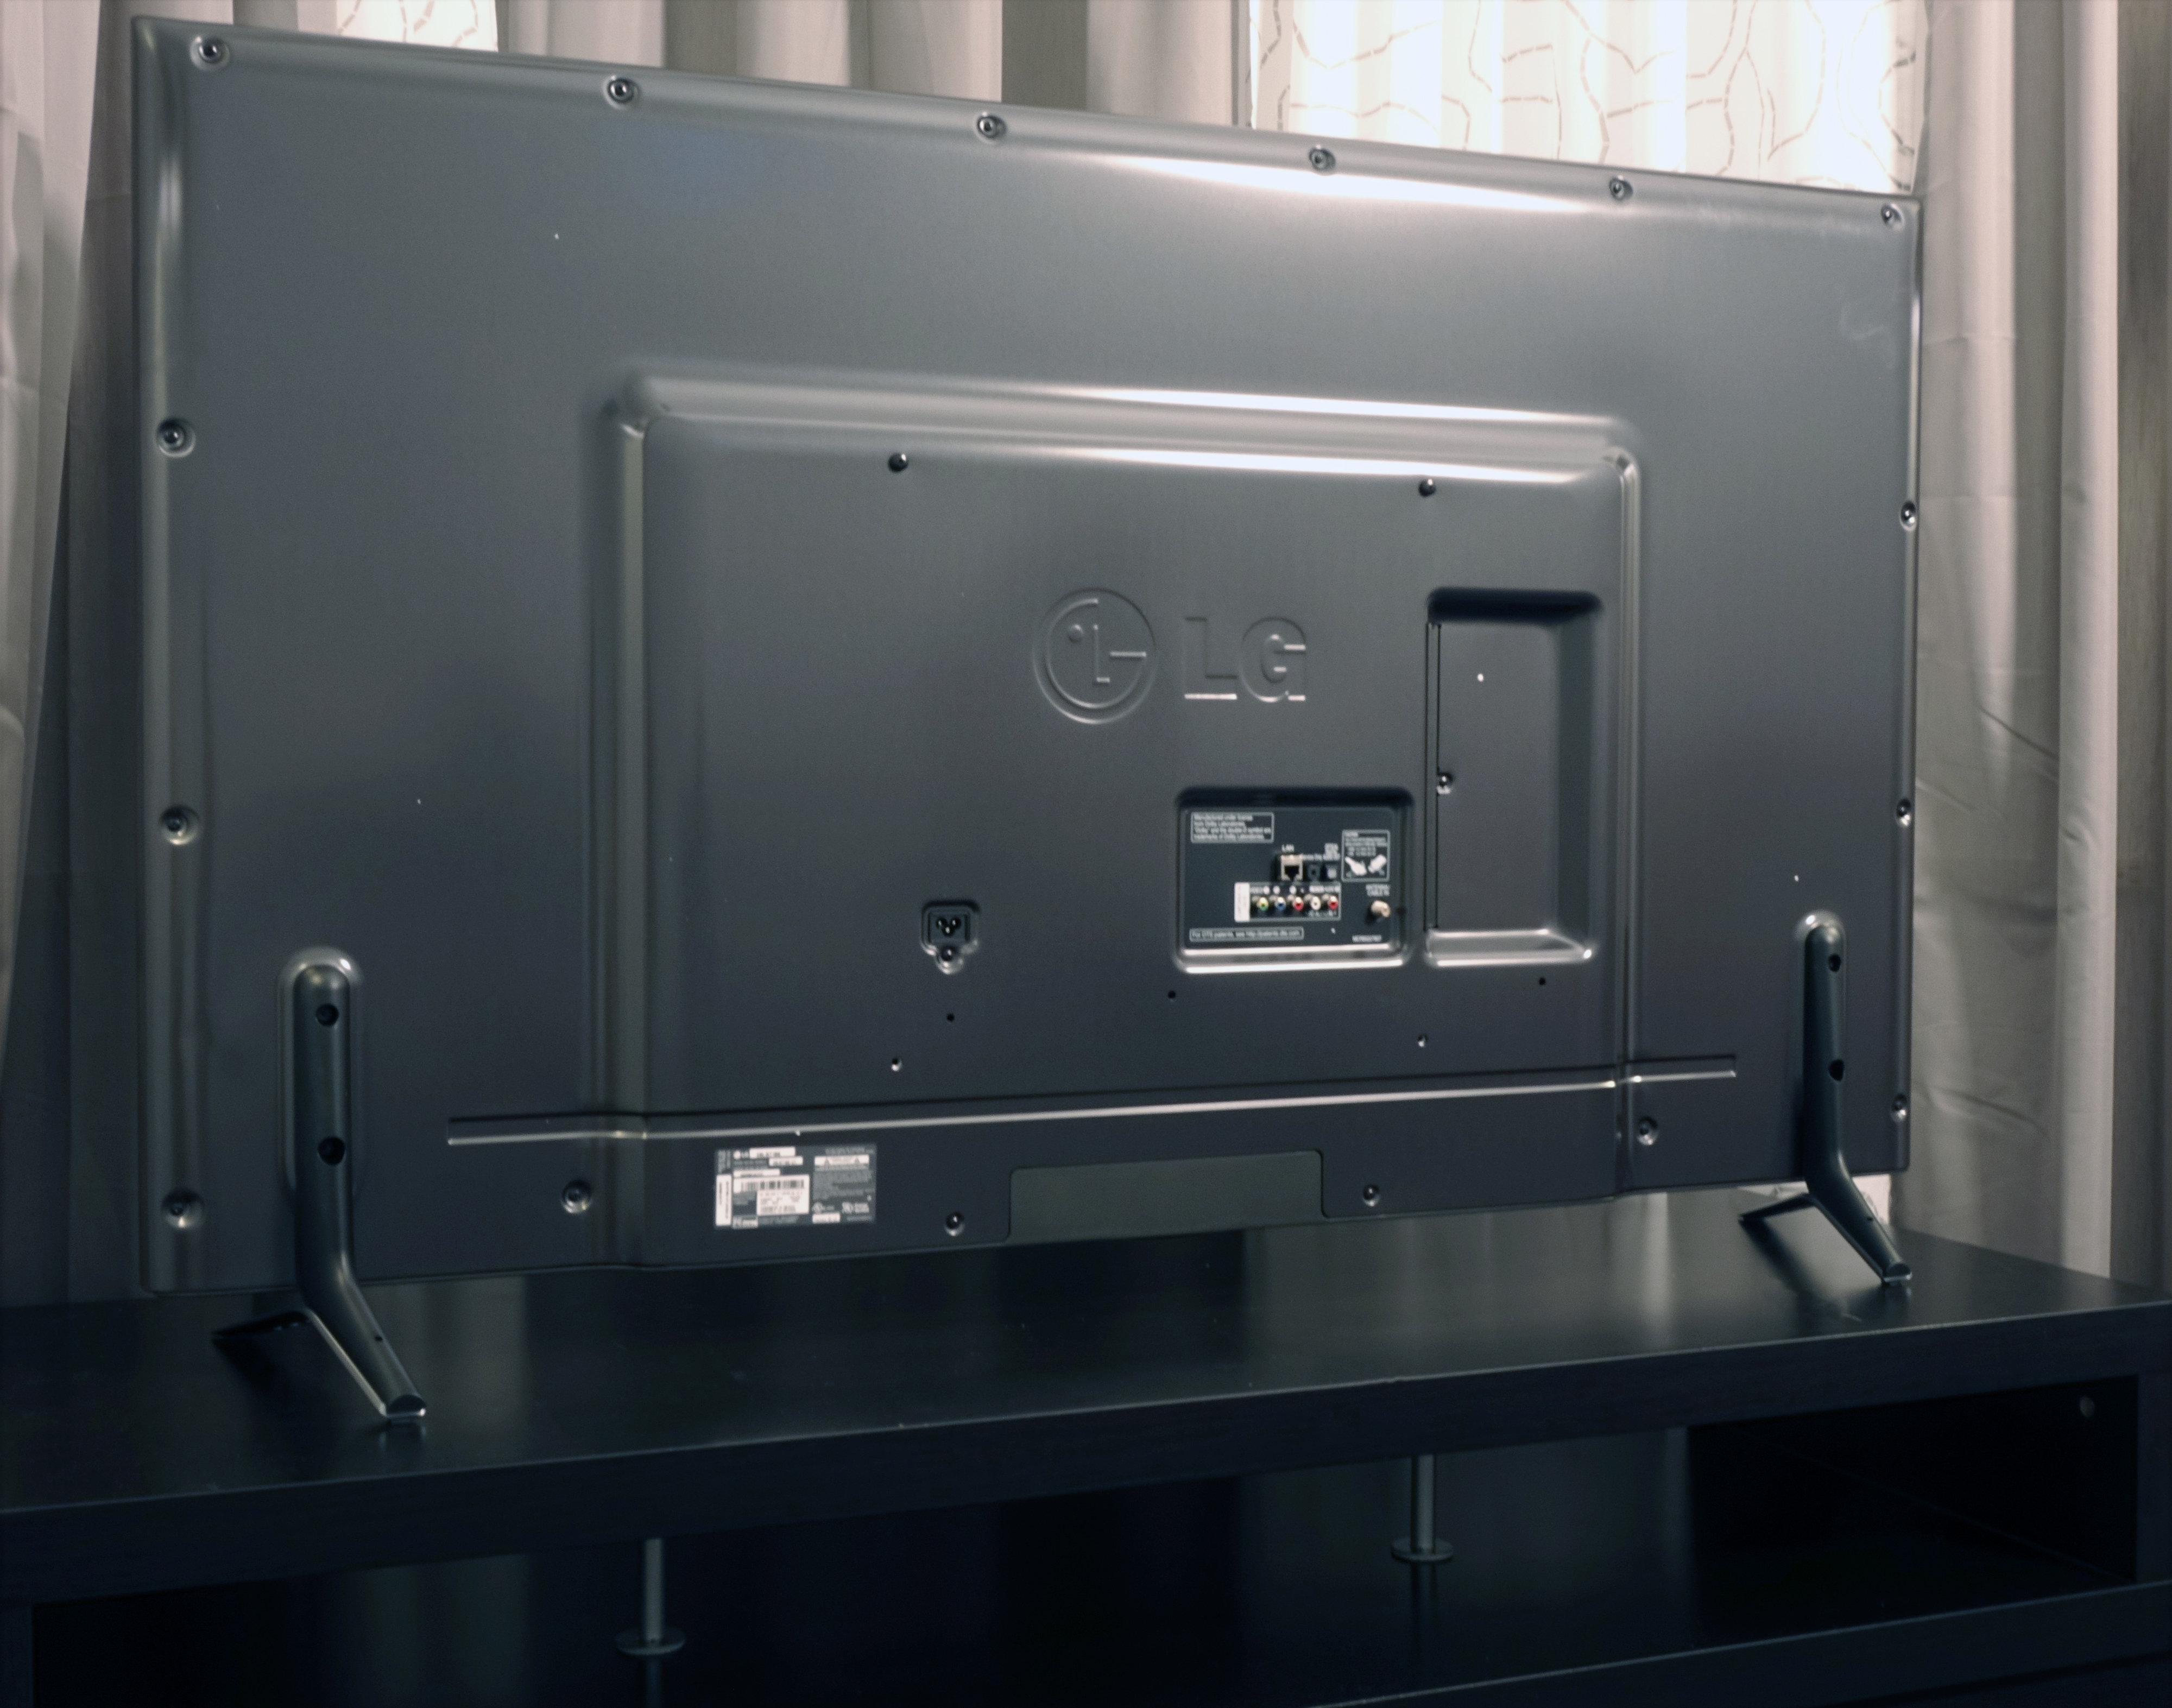 Back of the LG 60LB7100